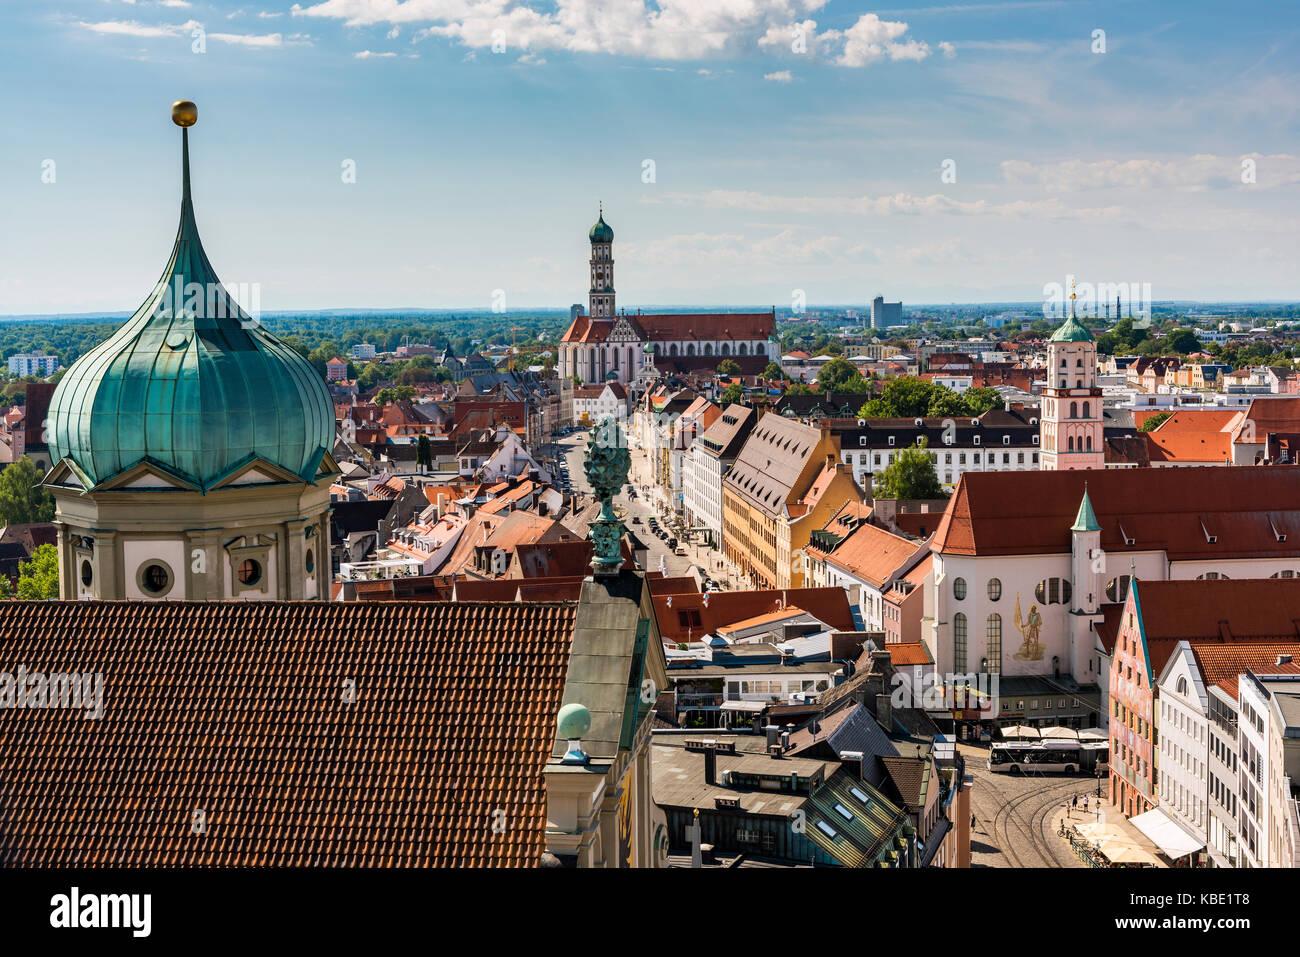 City skyline, Augsburg, Bavaria, Germany - Stock Image